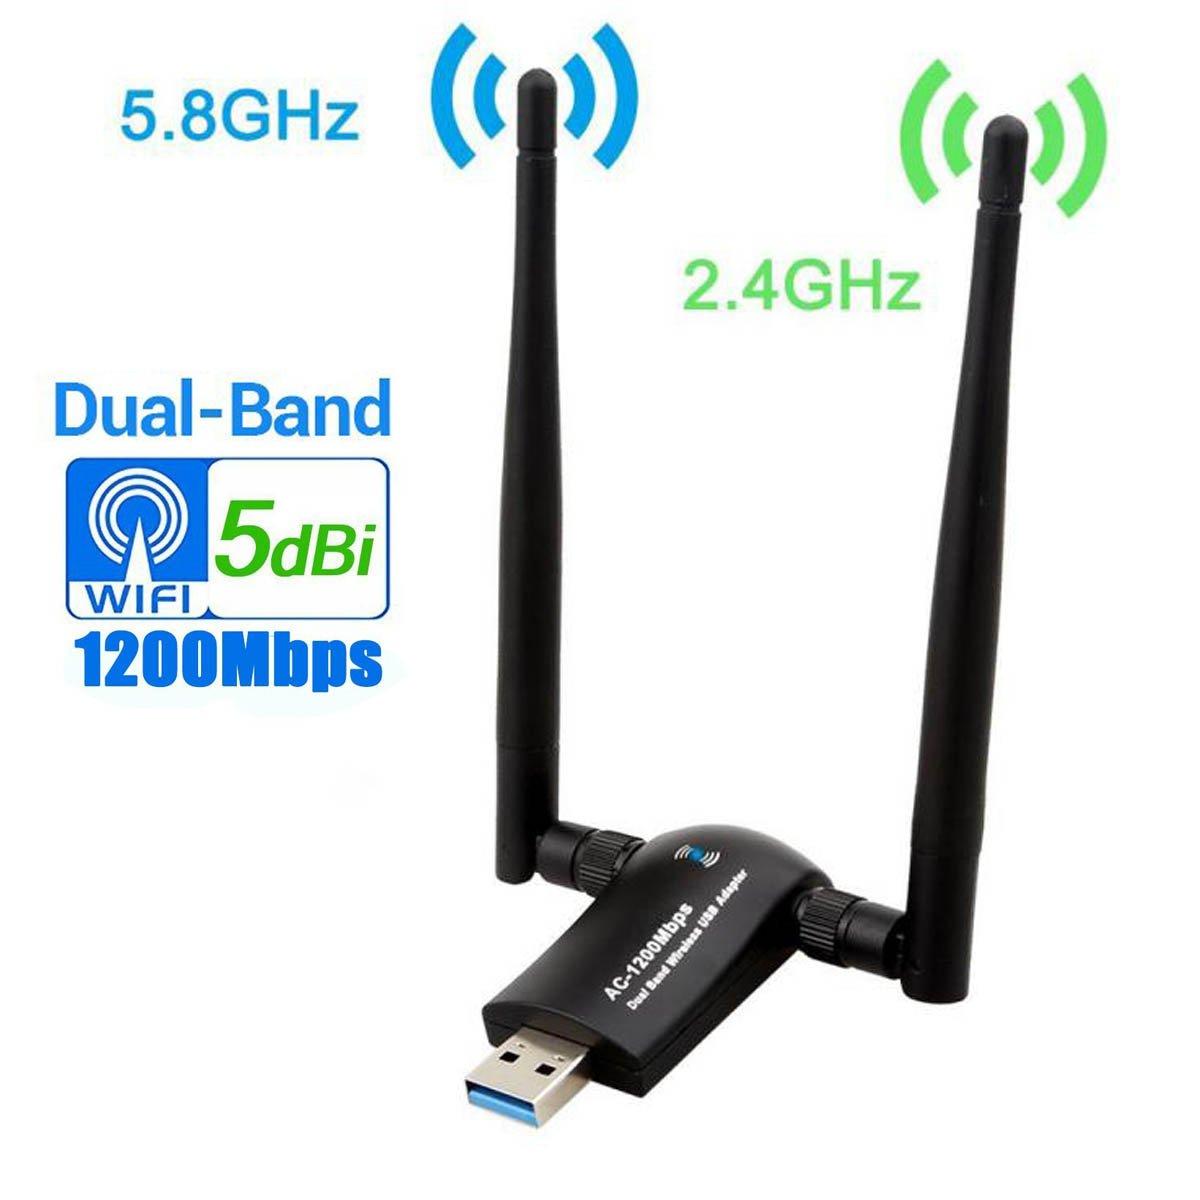 Wireless USB WiFi Adapter 1200Mbps, Dual Band 2.4GHz/300Mbps 5GHz/867Mbps High Gain Dual 5dBi Antennas Network WiFi USB 3.0 for Desktop Laptop, Support Windows 10/8/7/XP, Mac OS X, Ubuntu Linux